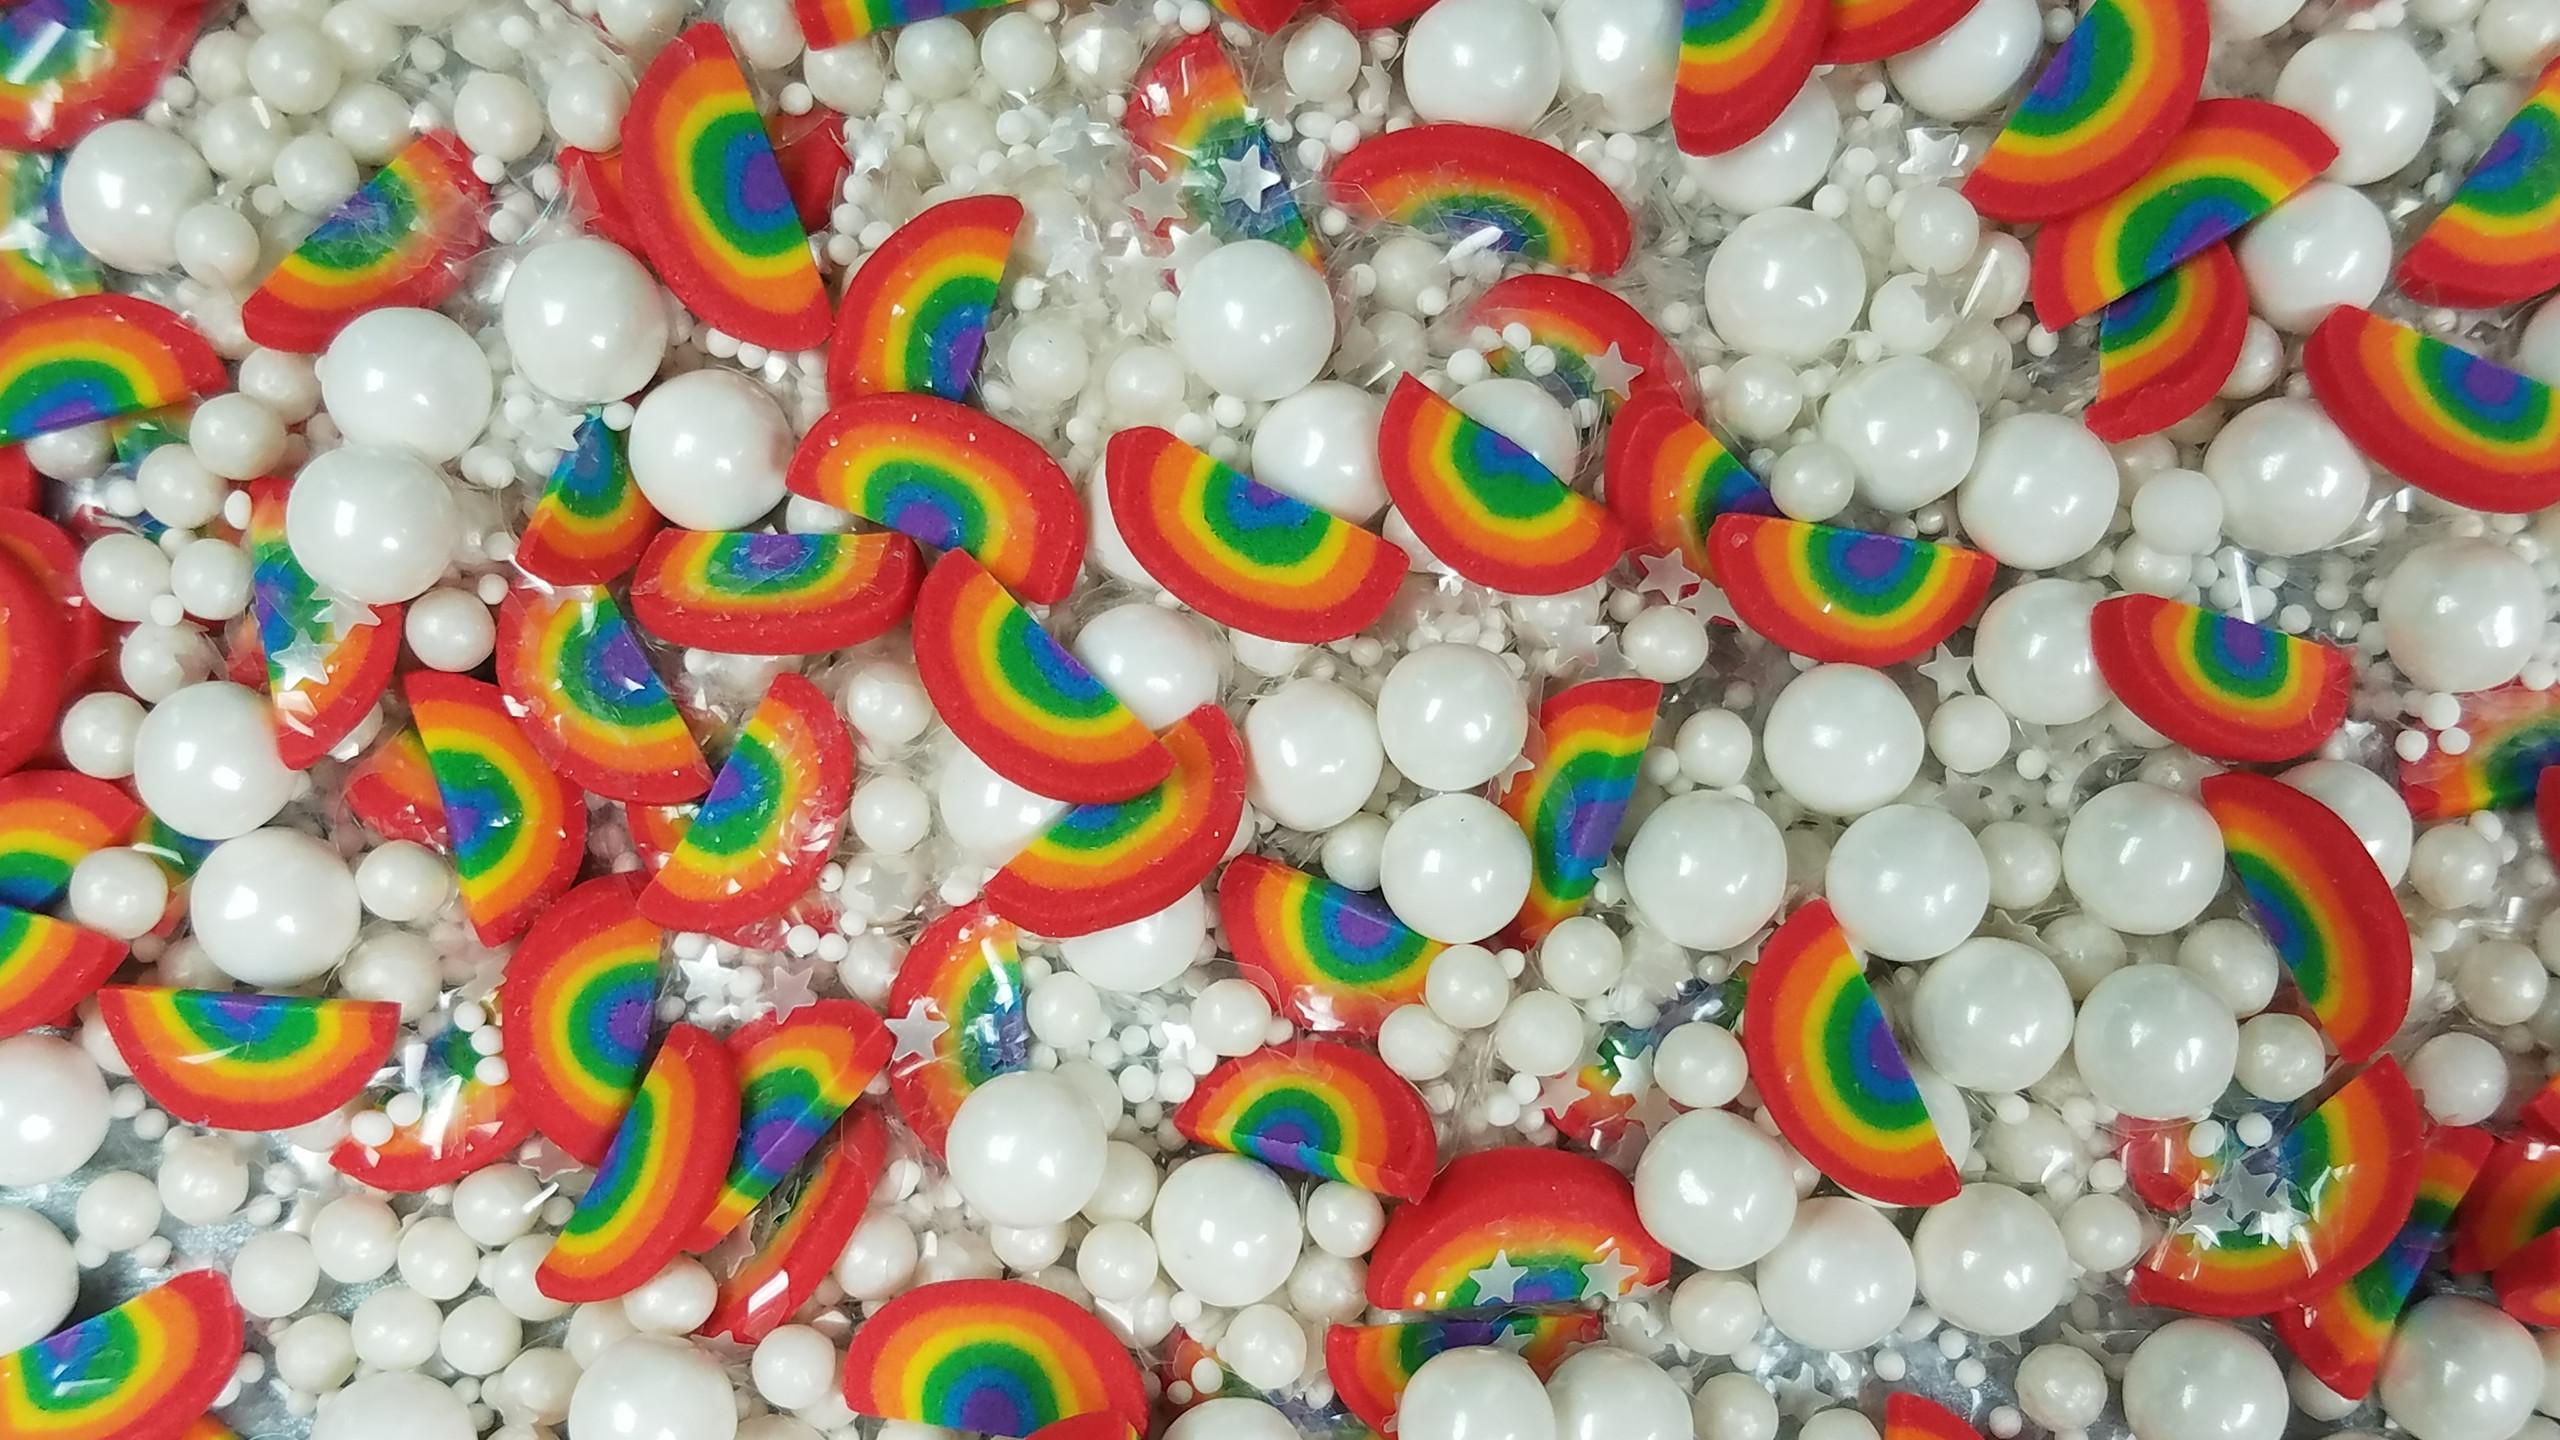 Rainbow Cloud Sprinkle Mix